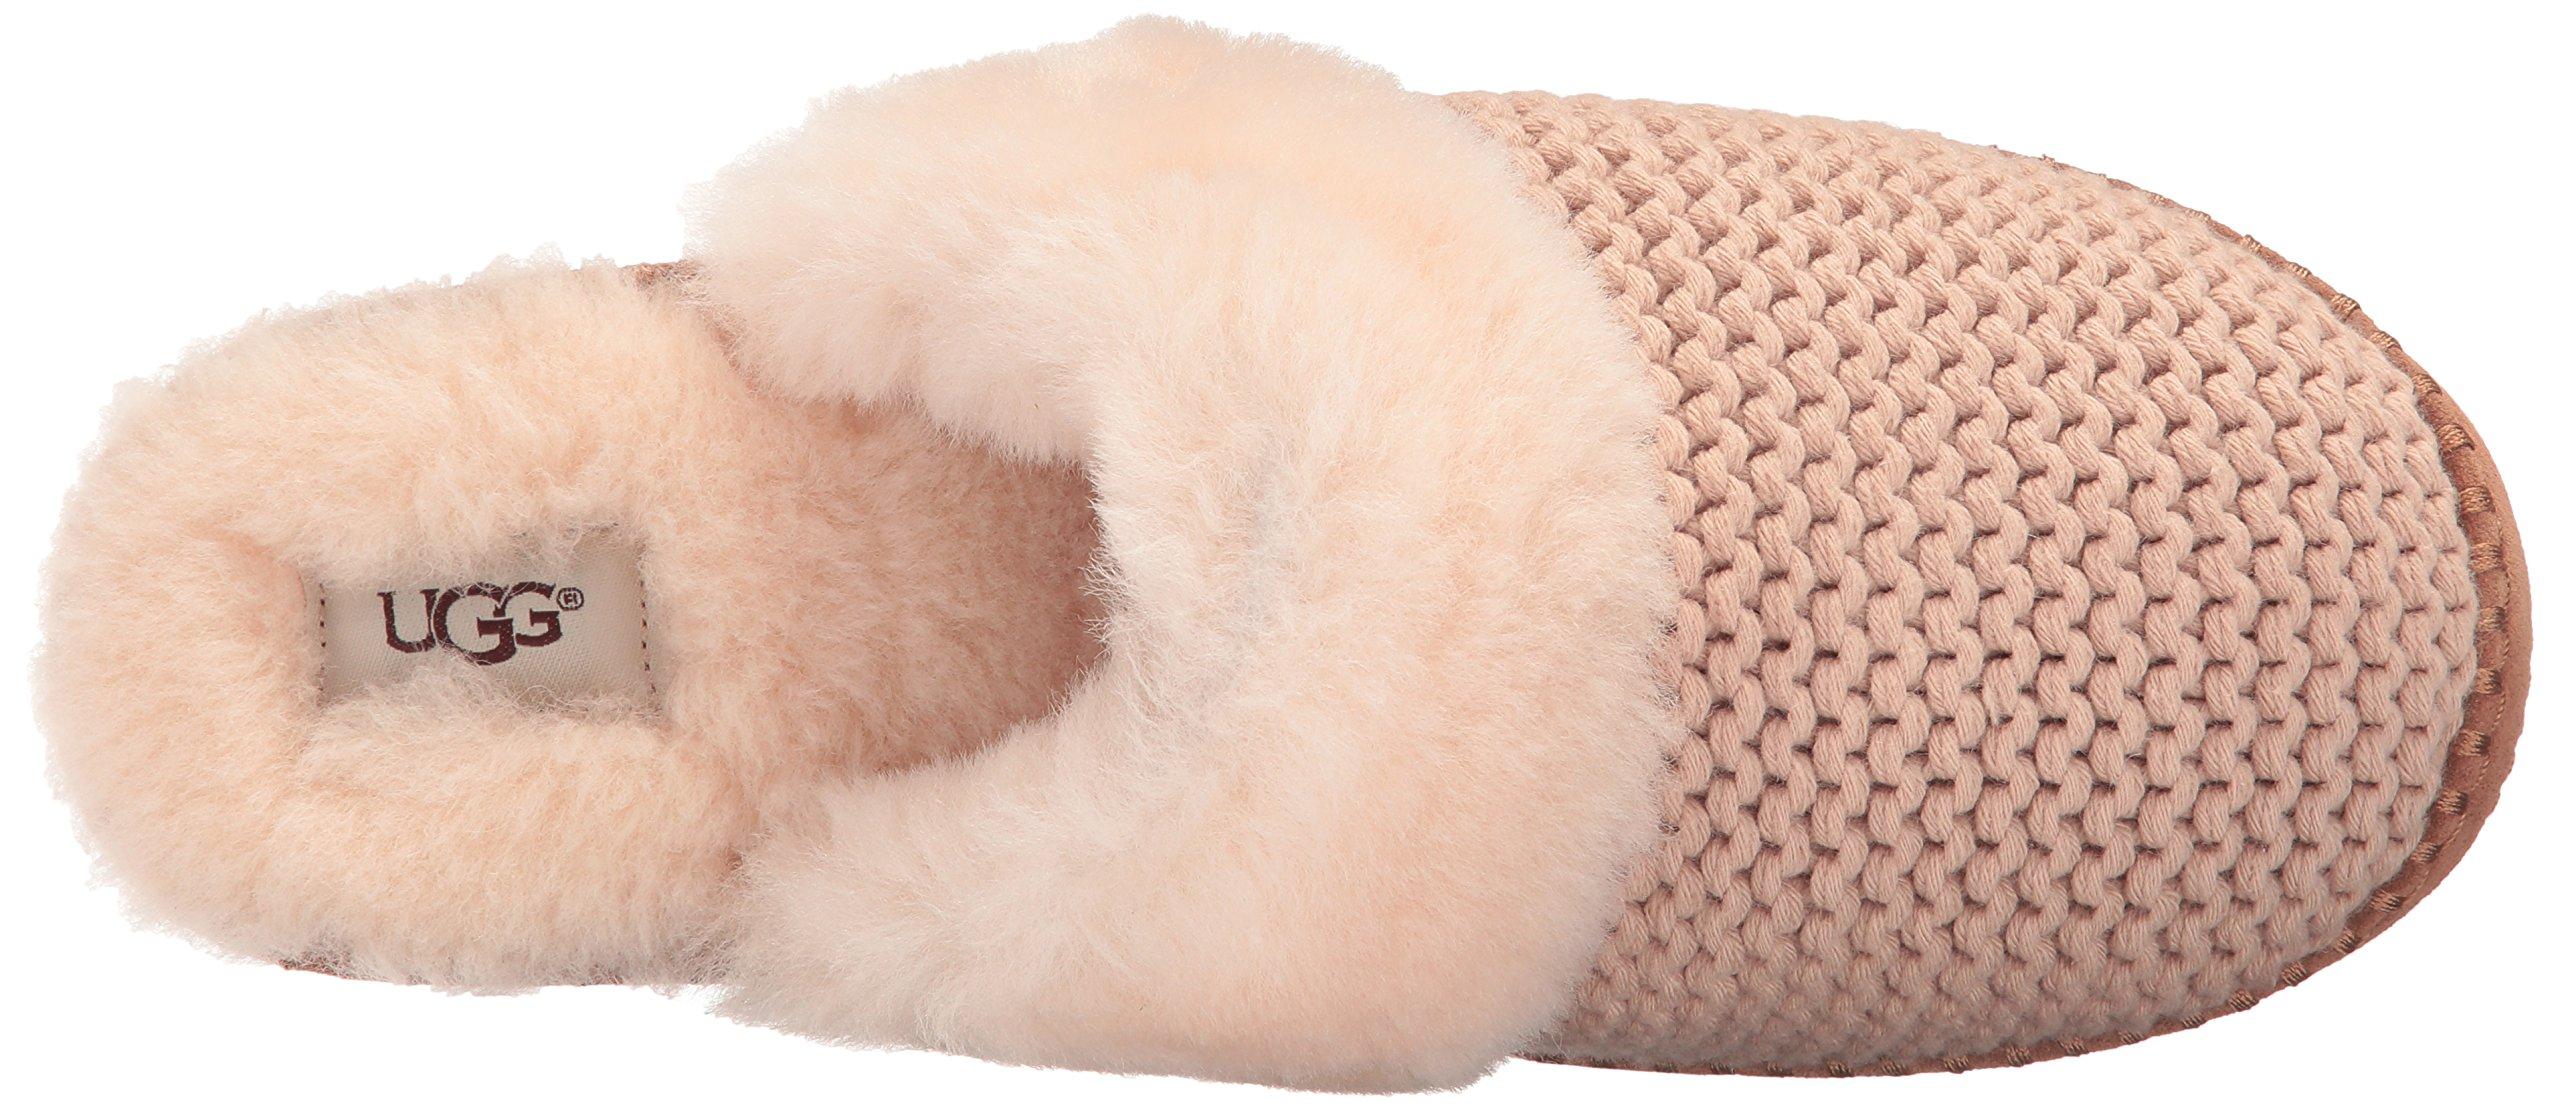 UGG Women's Aira Knit Slip on Slipper,Cream,12 M US by UGG (Image #8)